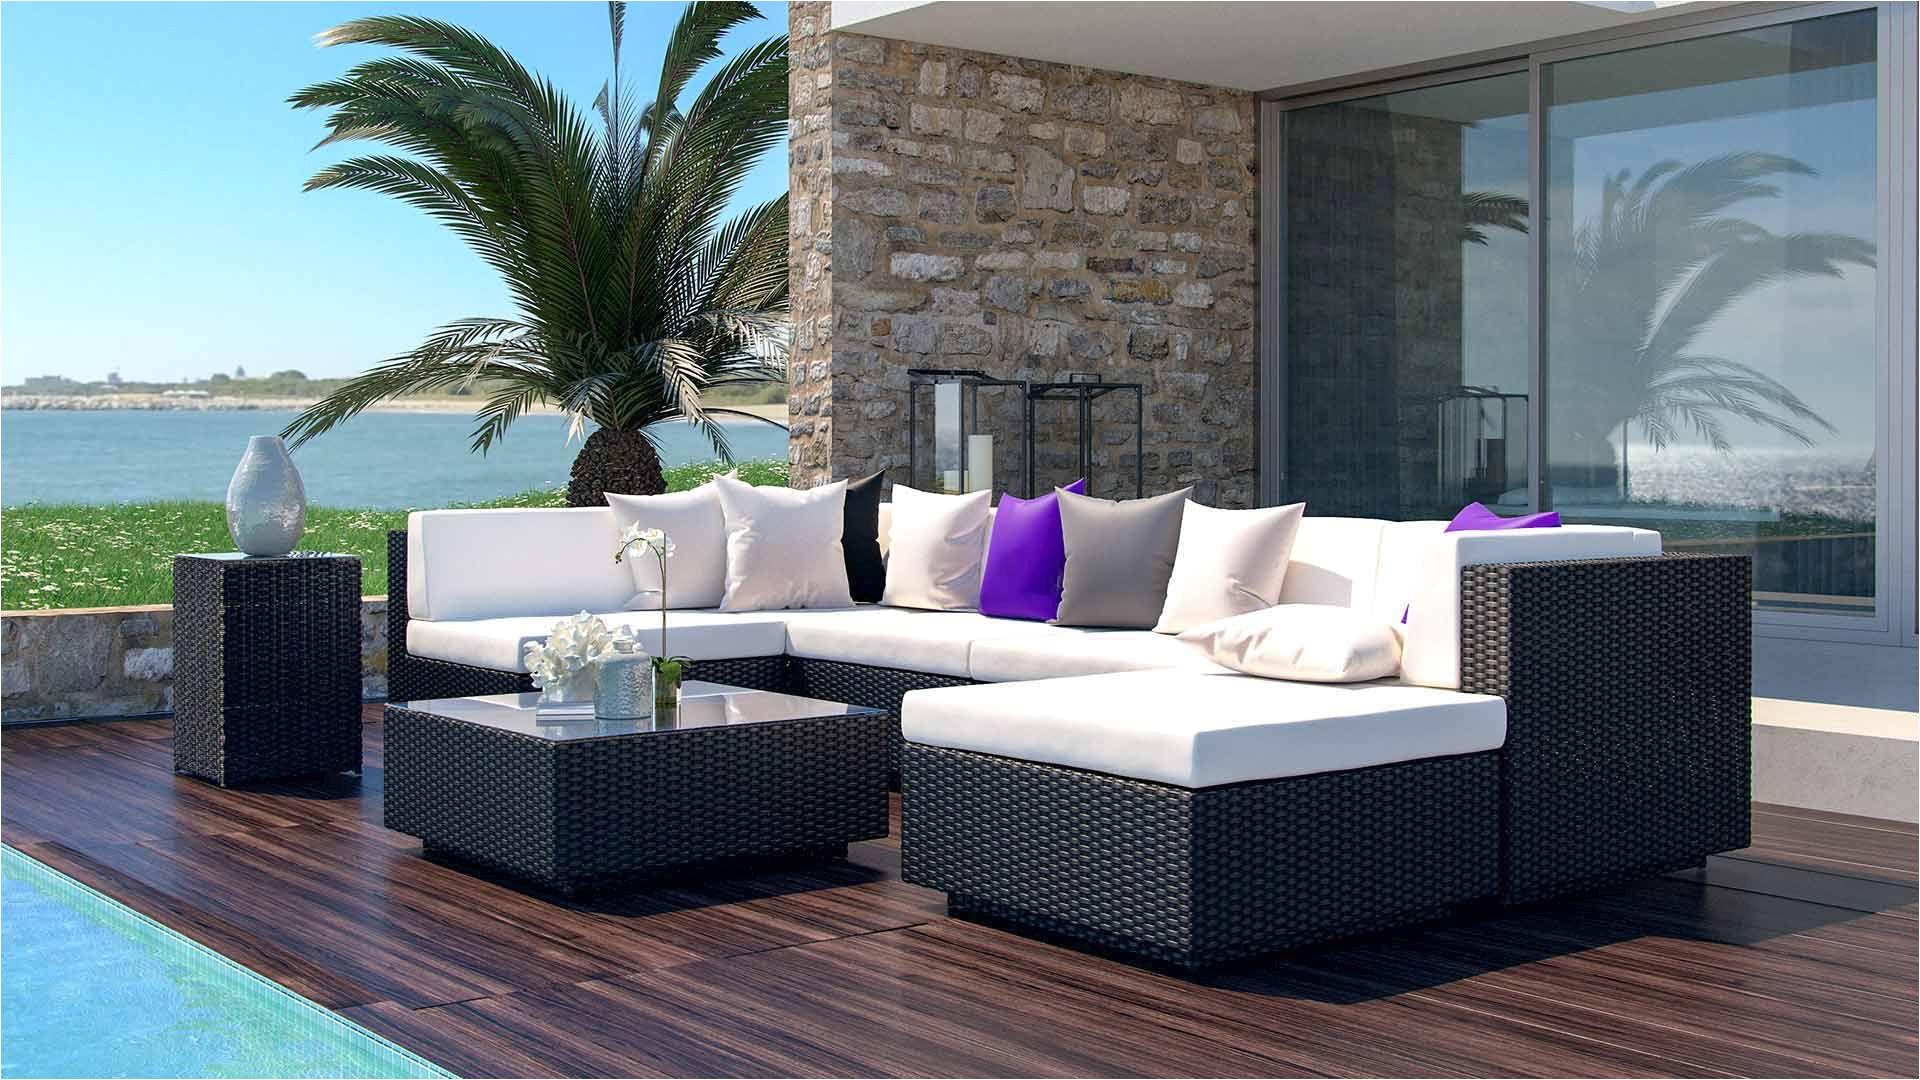 England Furniture Reviews 2019 Artelia Rattan Gartensofa Aus